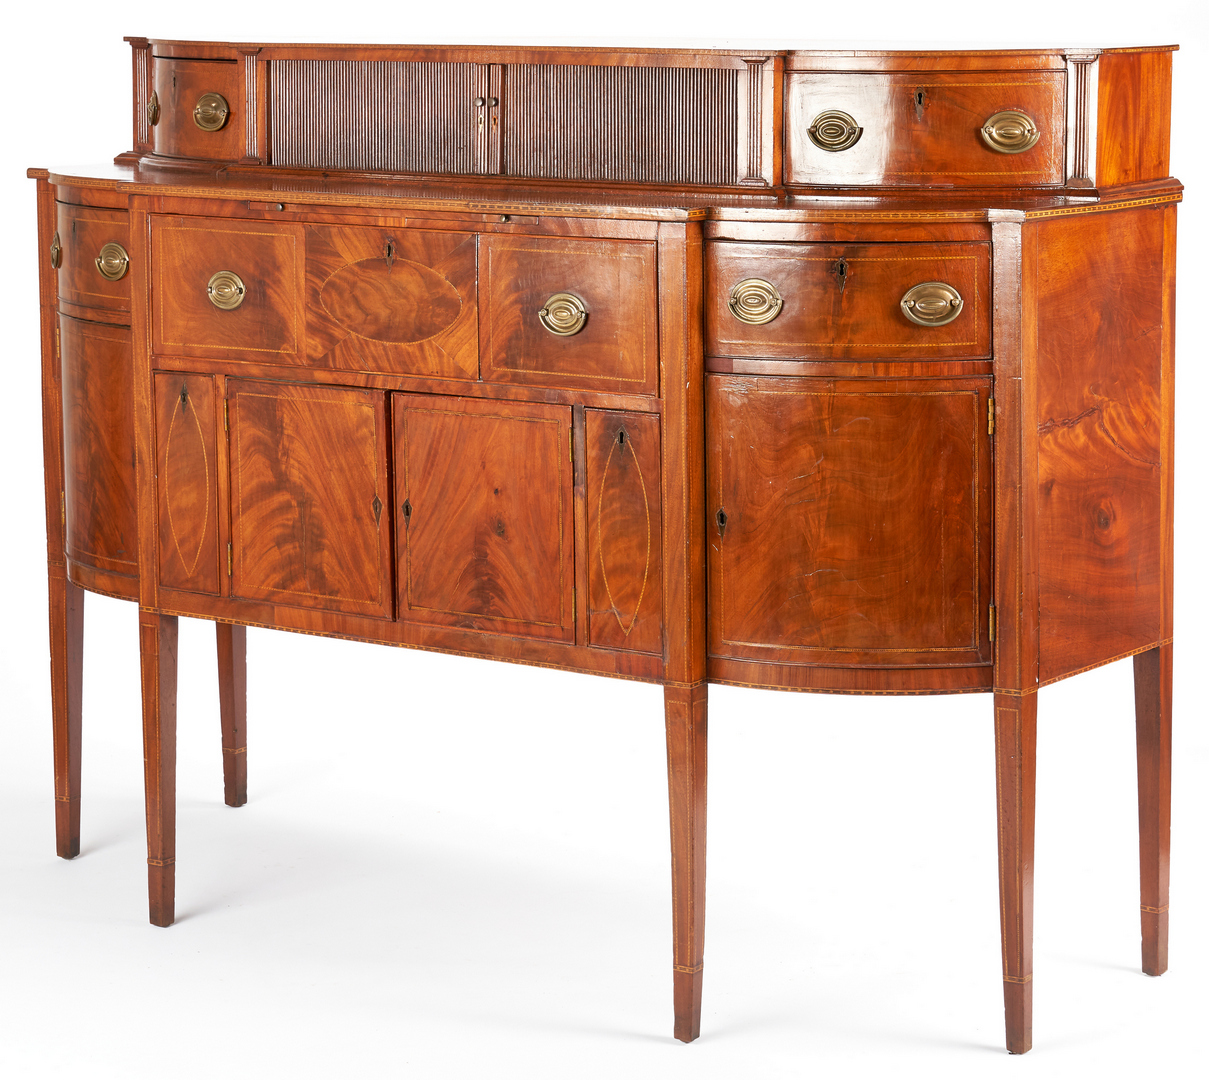 Lot 230: Federal Sideboard Desk, Mid-Atlantic or VA